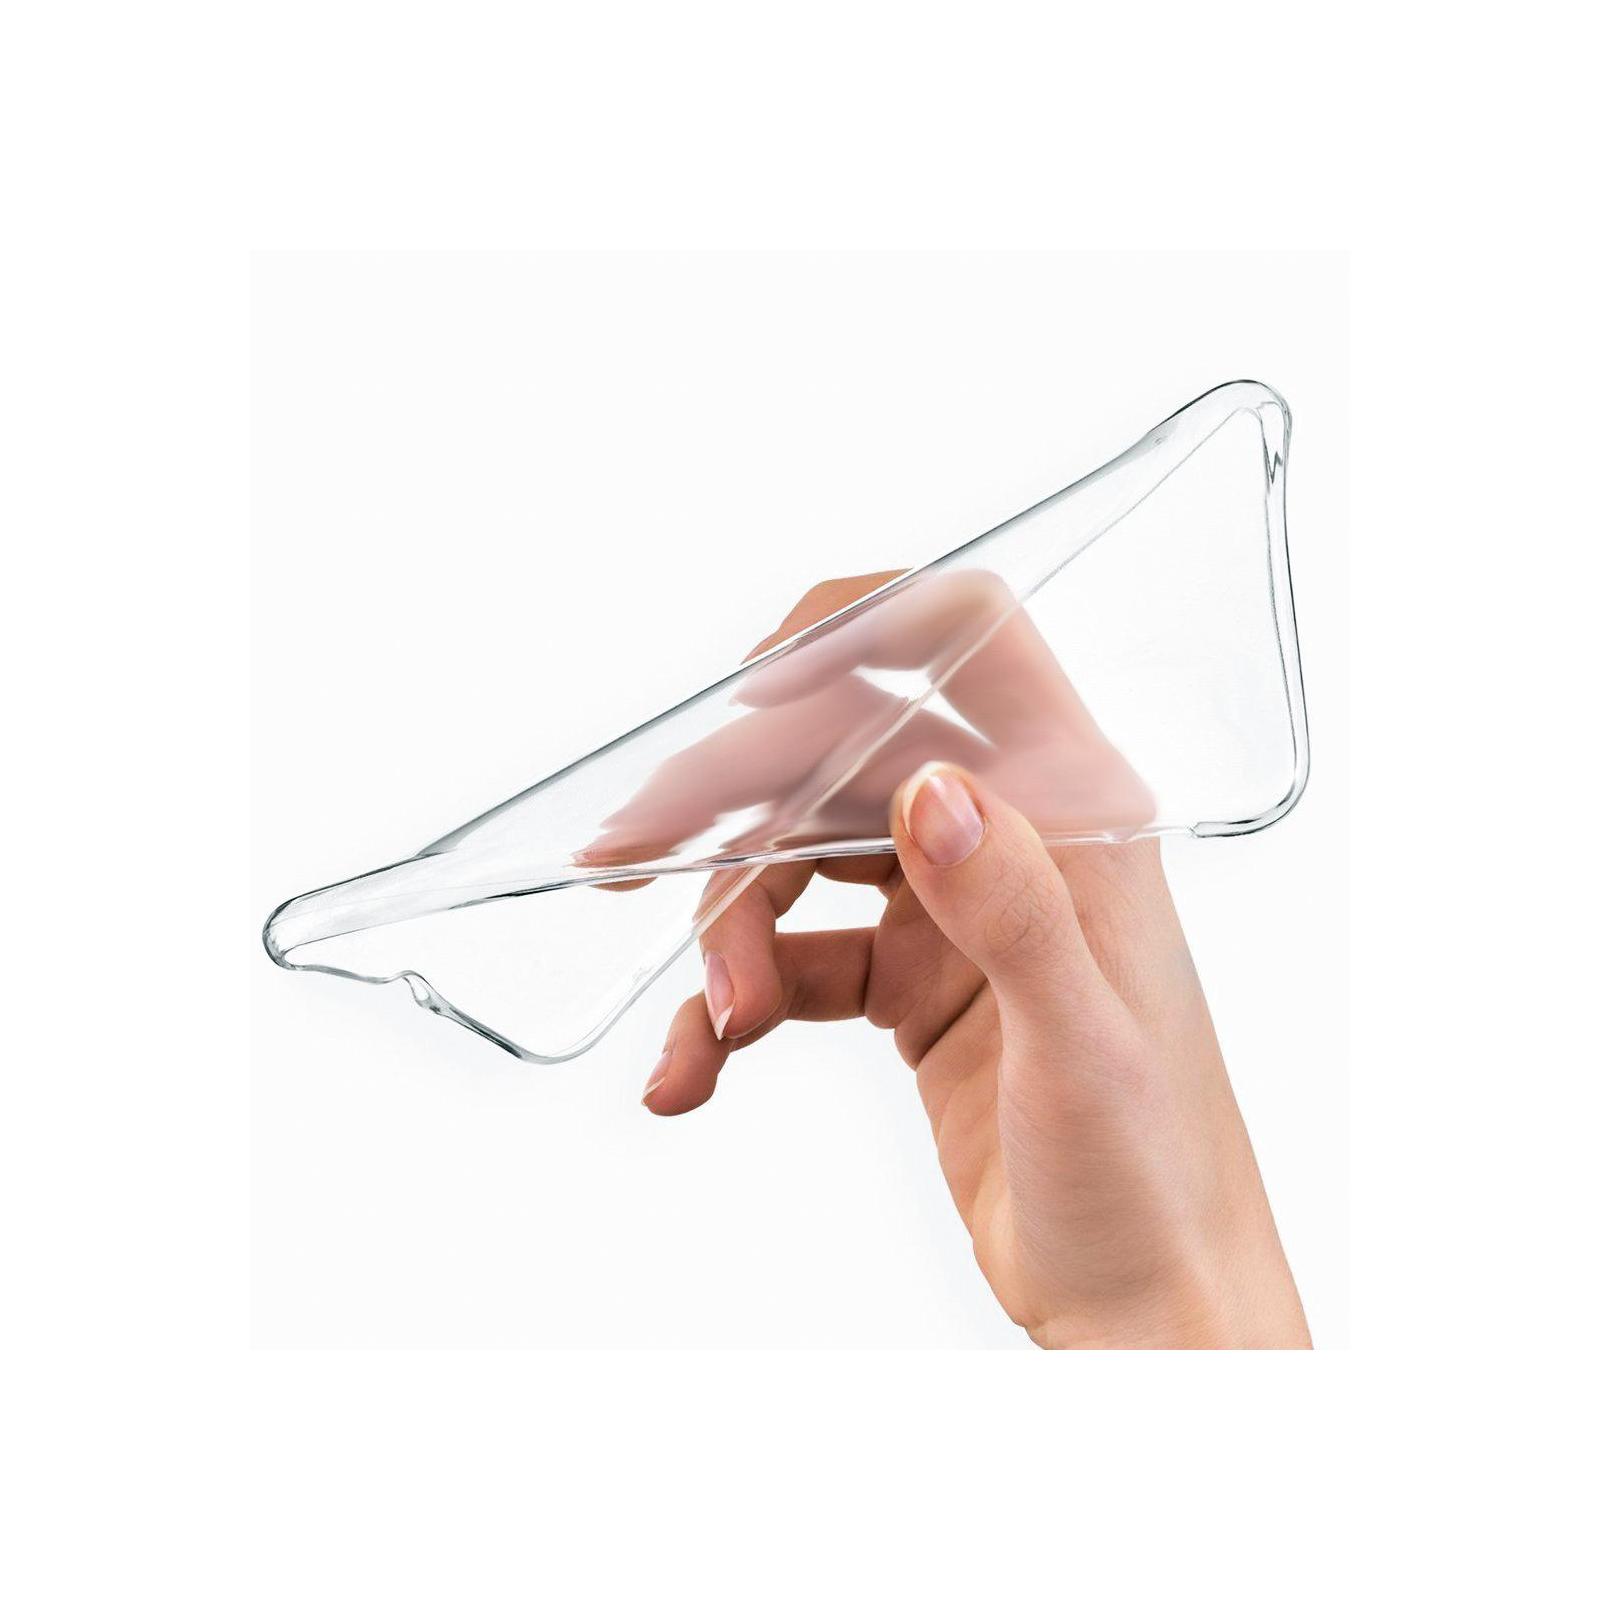 Чехол для моб. телефона SmartCase Samsung Galaxy J5 / J510 TPU Clear (SC-J510) изображение 5